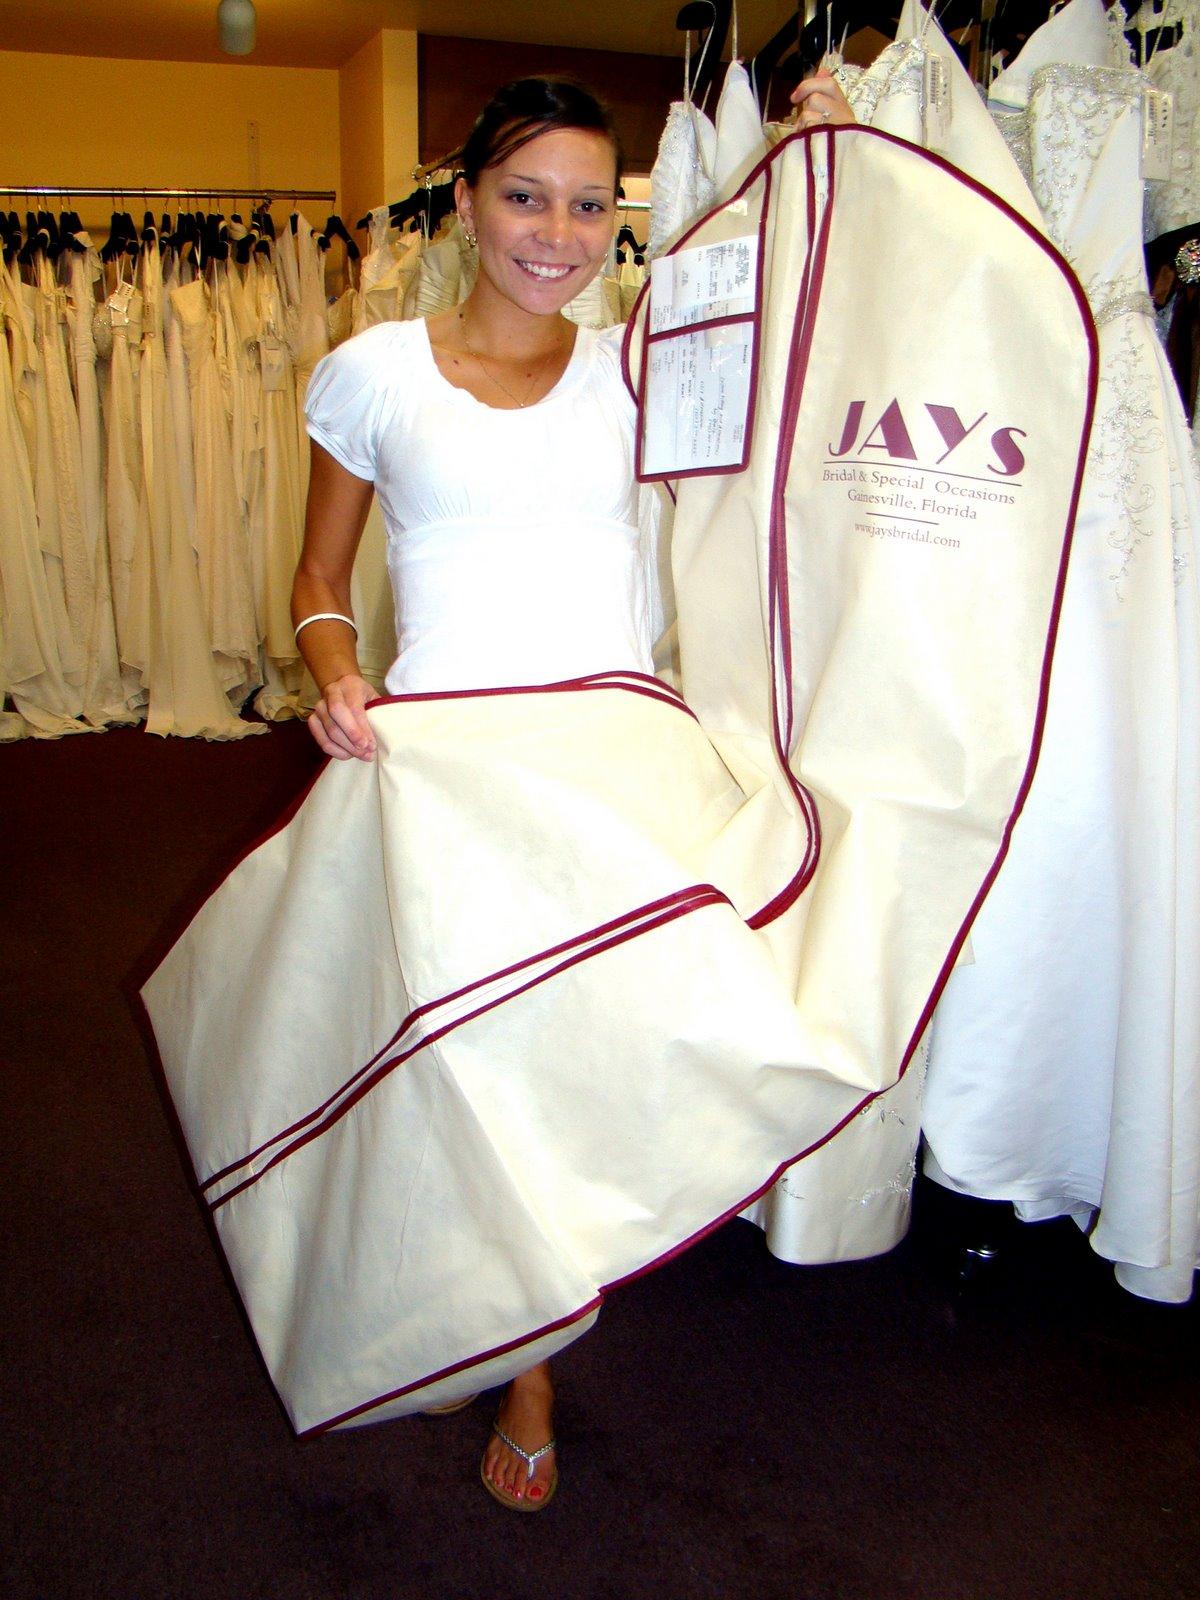 Wedding Dress Shopping!